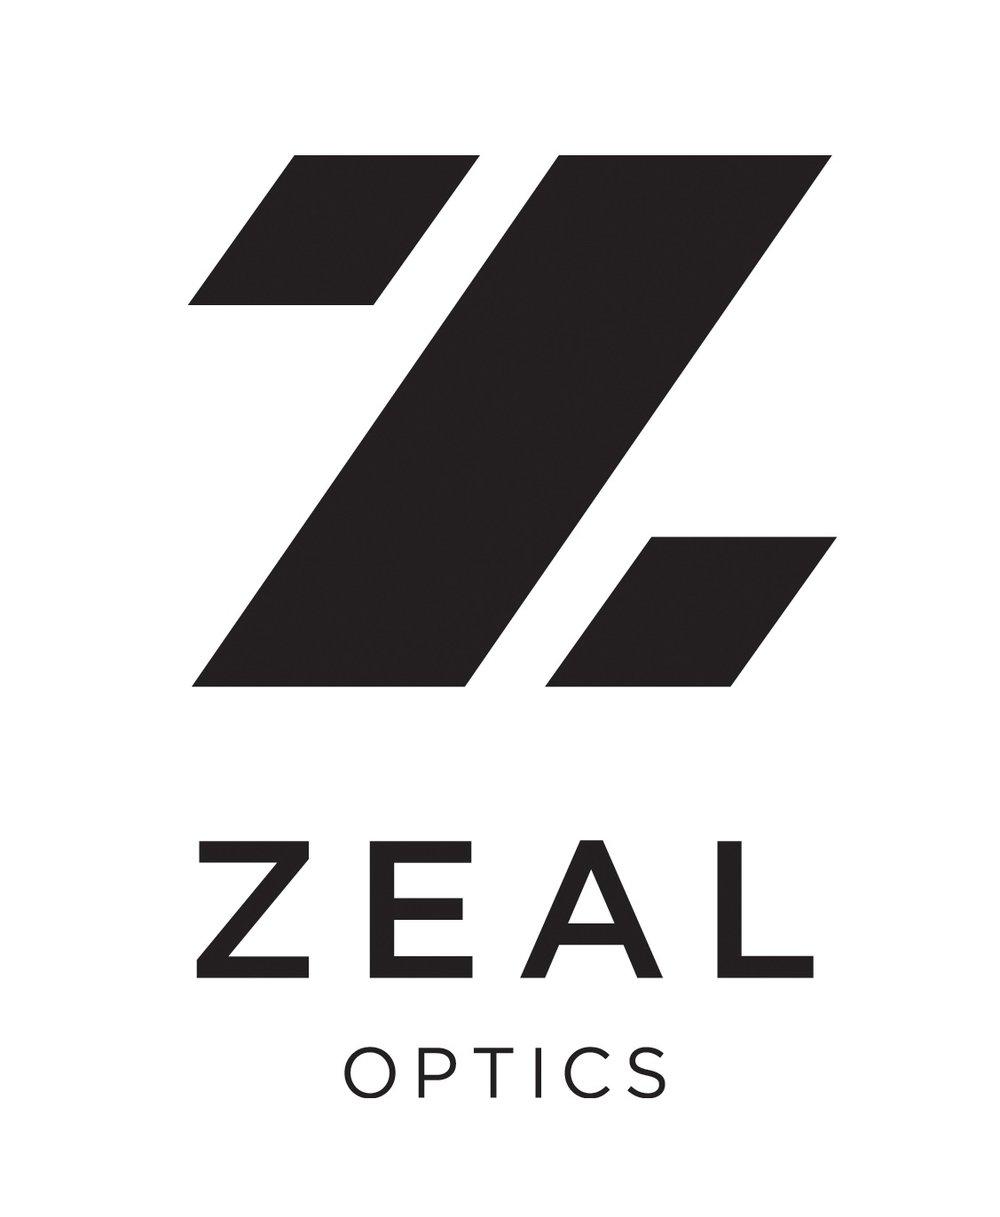 zeal_logo_blk.png